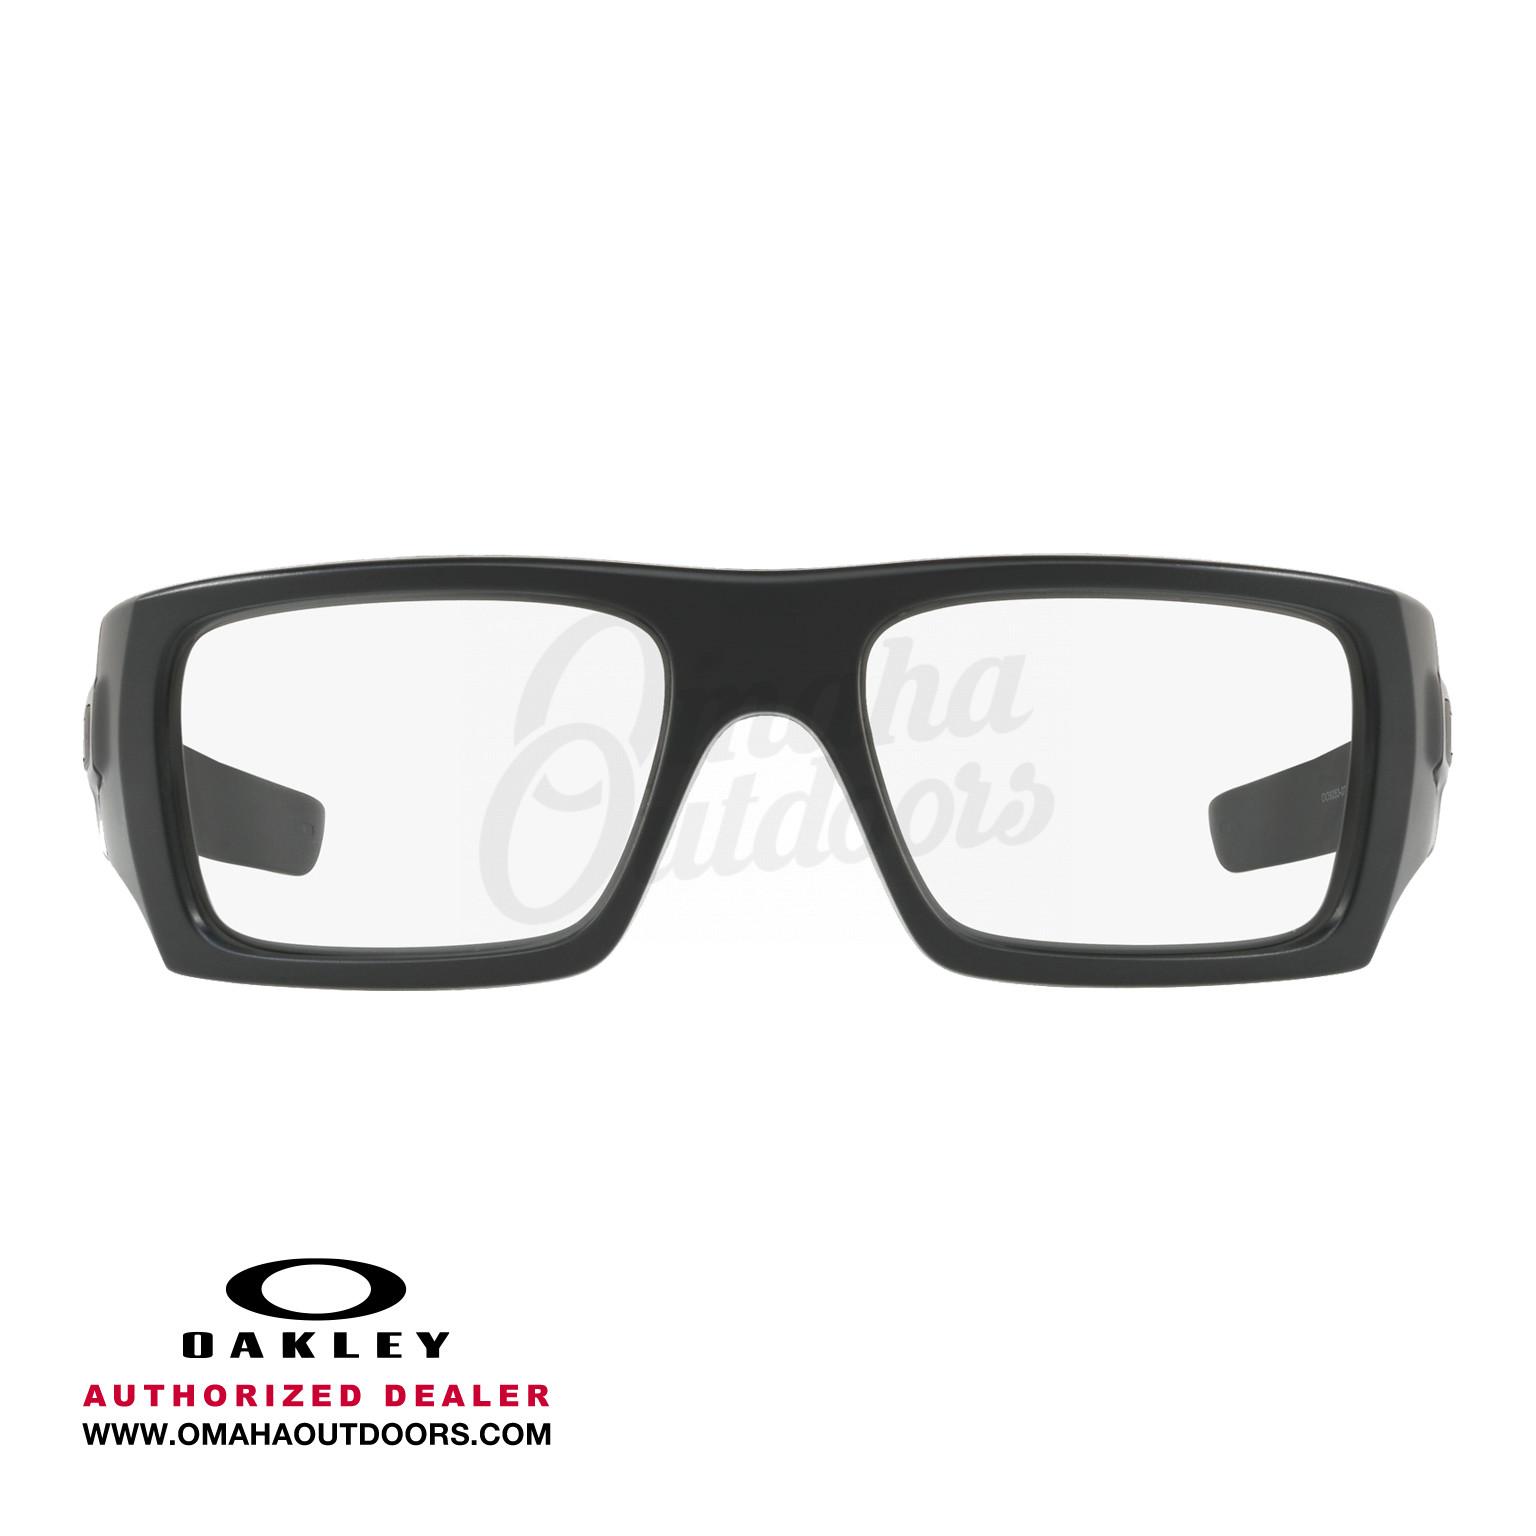 874e97cb72 Oakley Det Cord Industrial - ANSI Z87.1 Stamped Safety Eyeglasses ...